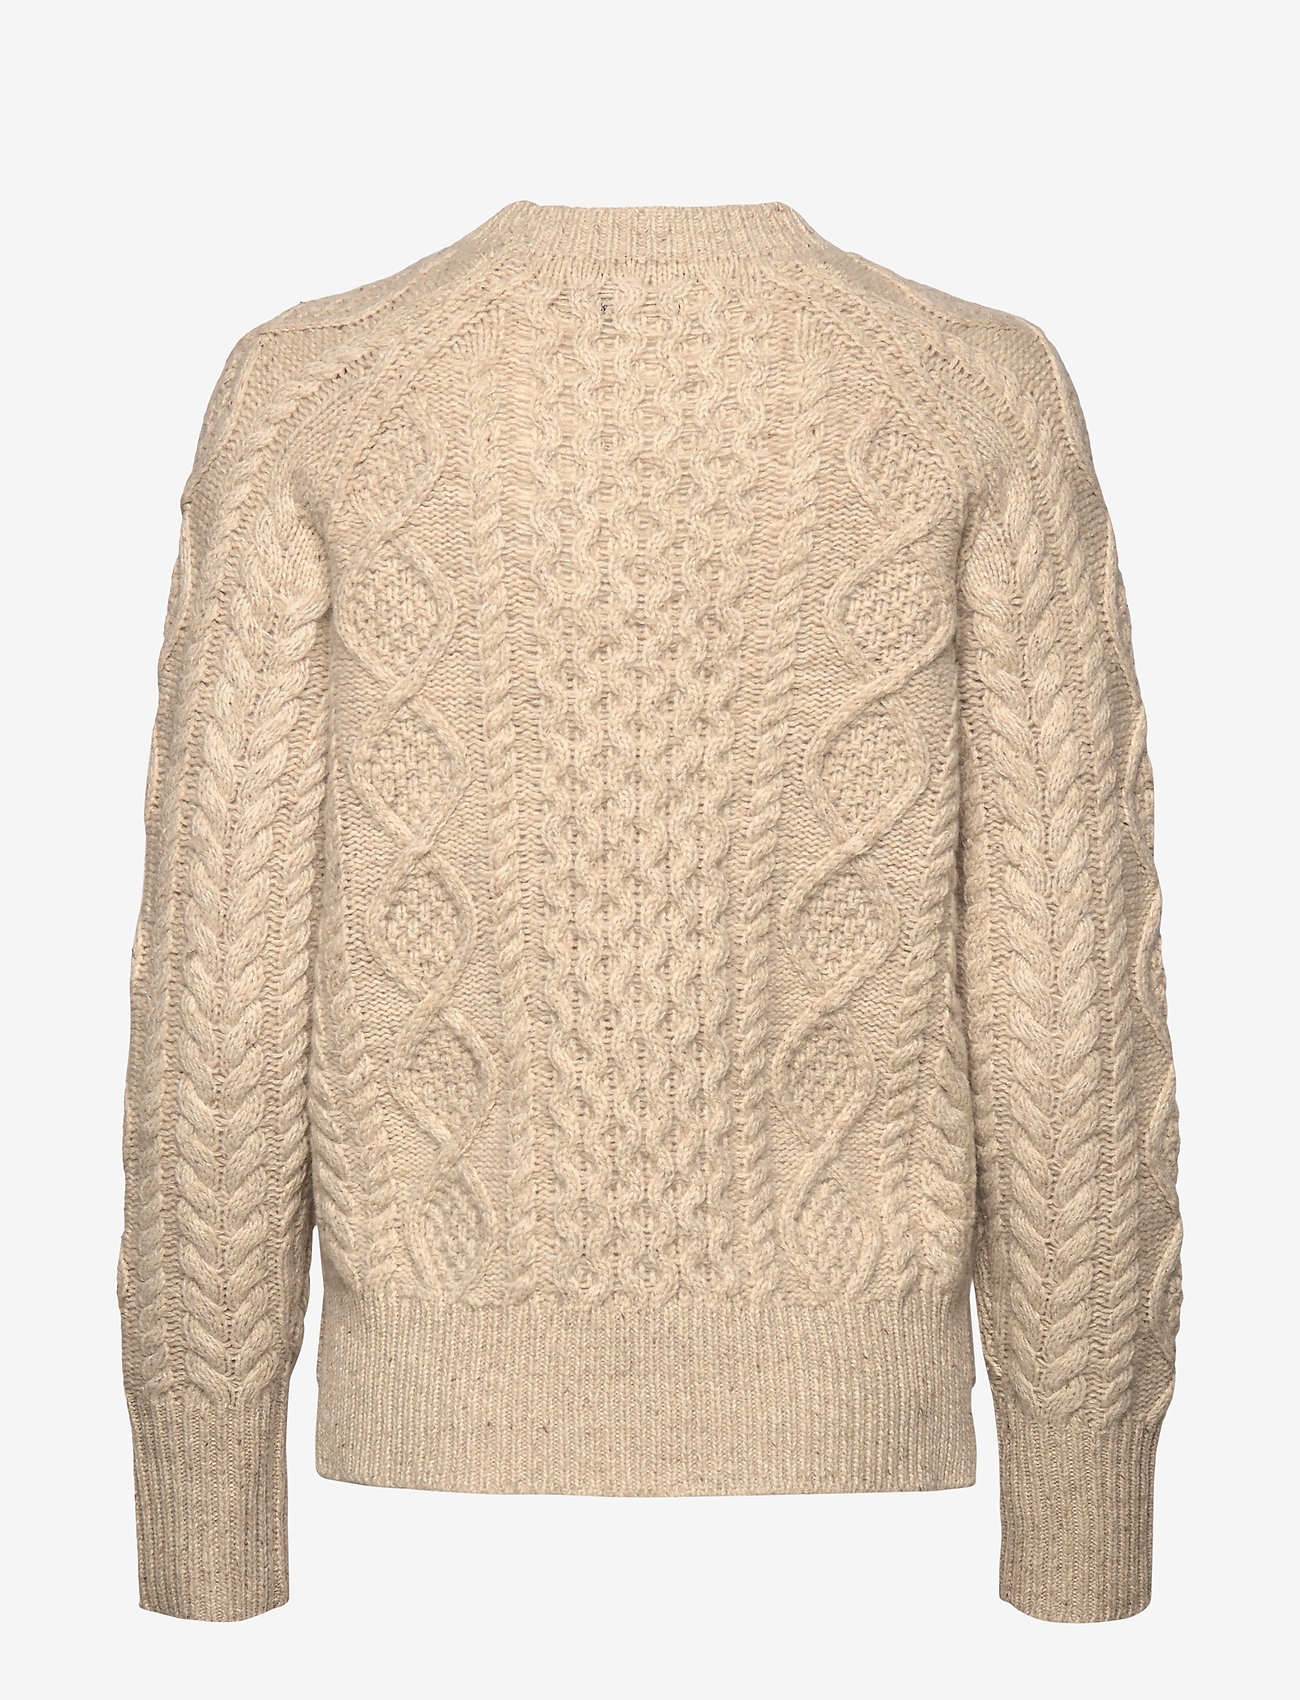 Aran-knit Wool-blend Sweater (Oatmeal) - Polo Ralph Lauren dsL6oR